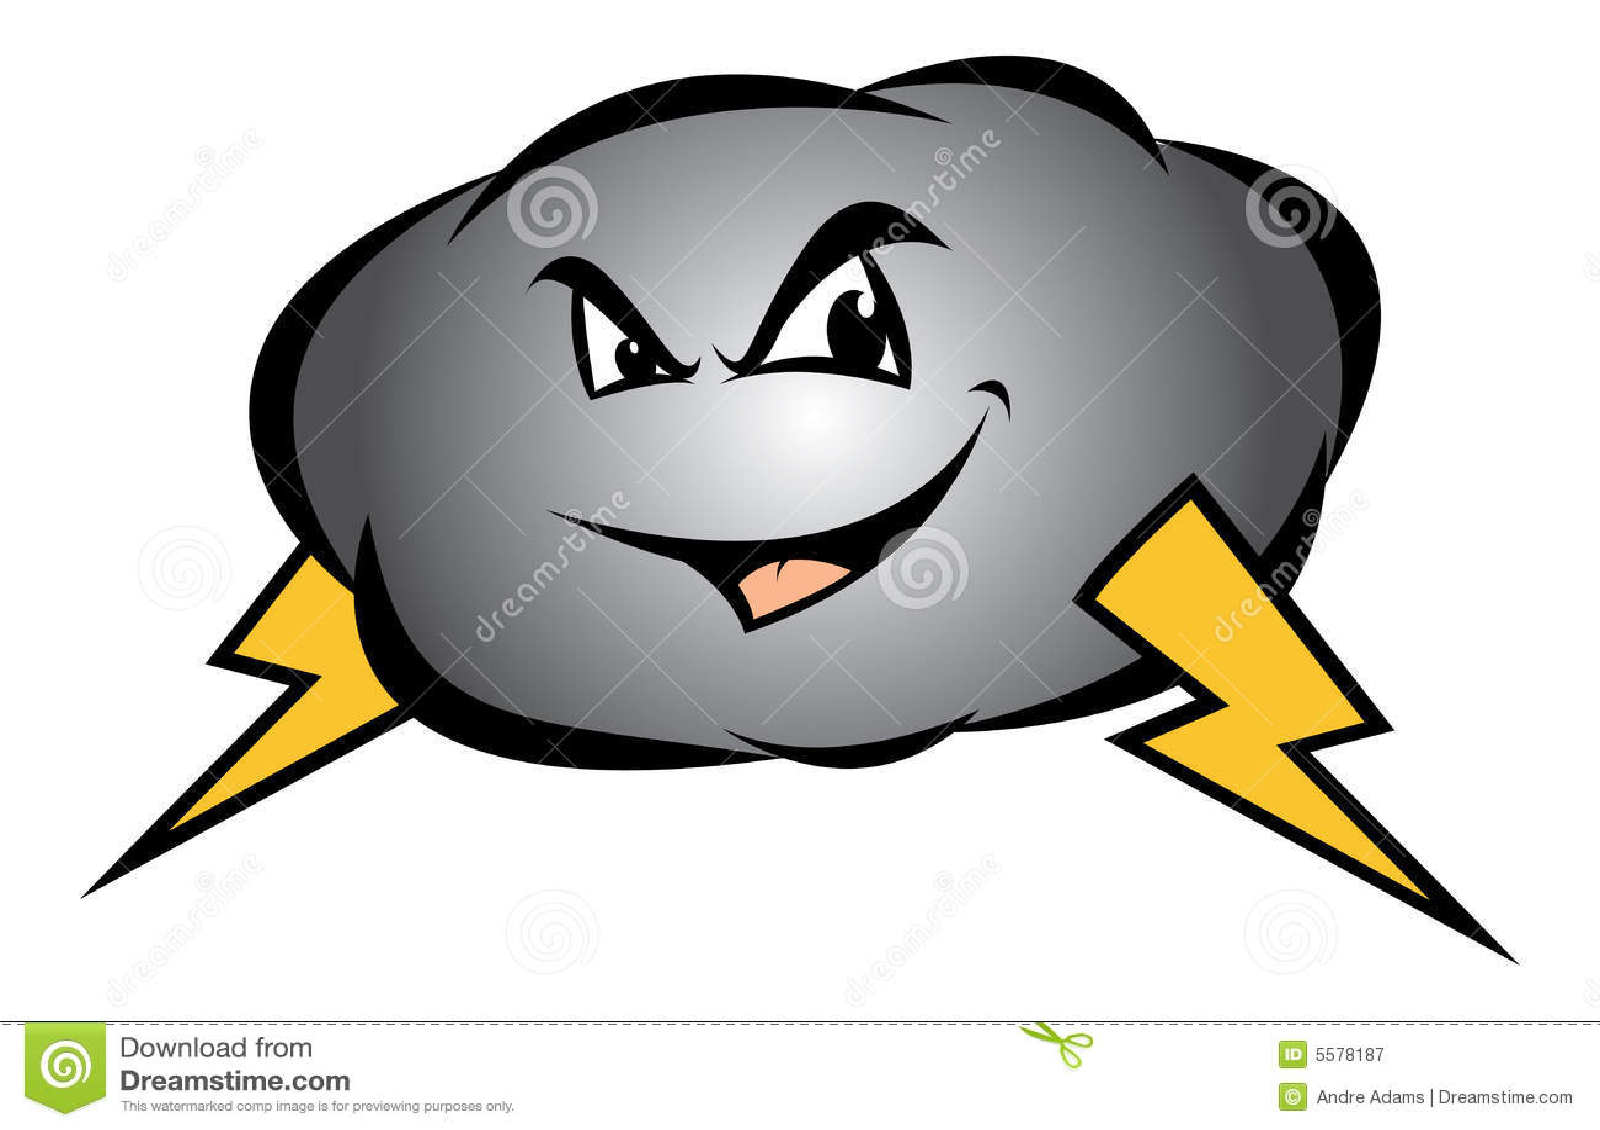 Thunderstorm Cartoon Images   Cartoon Storm